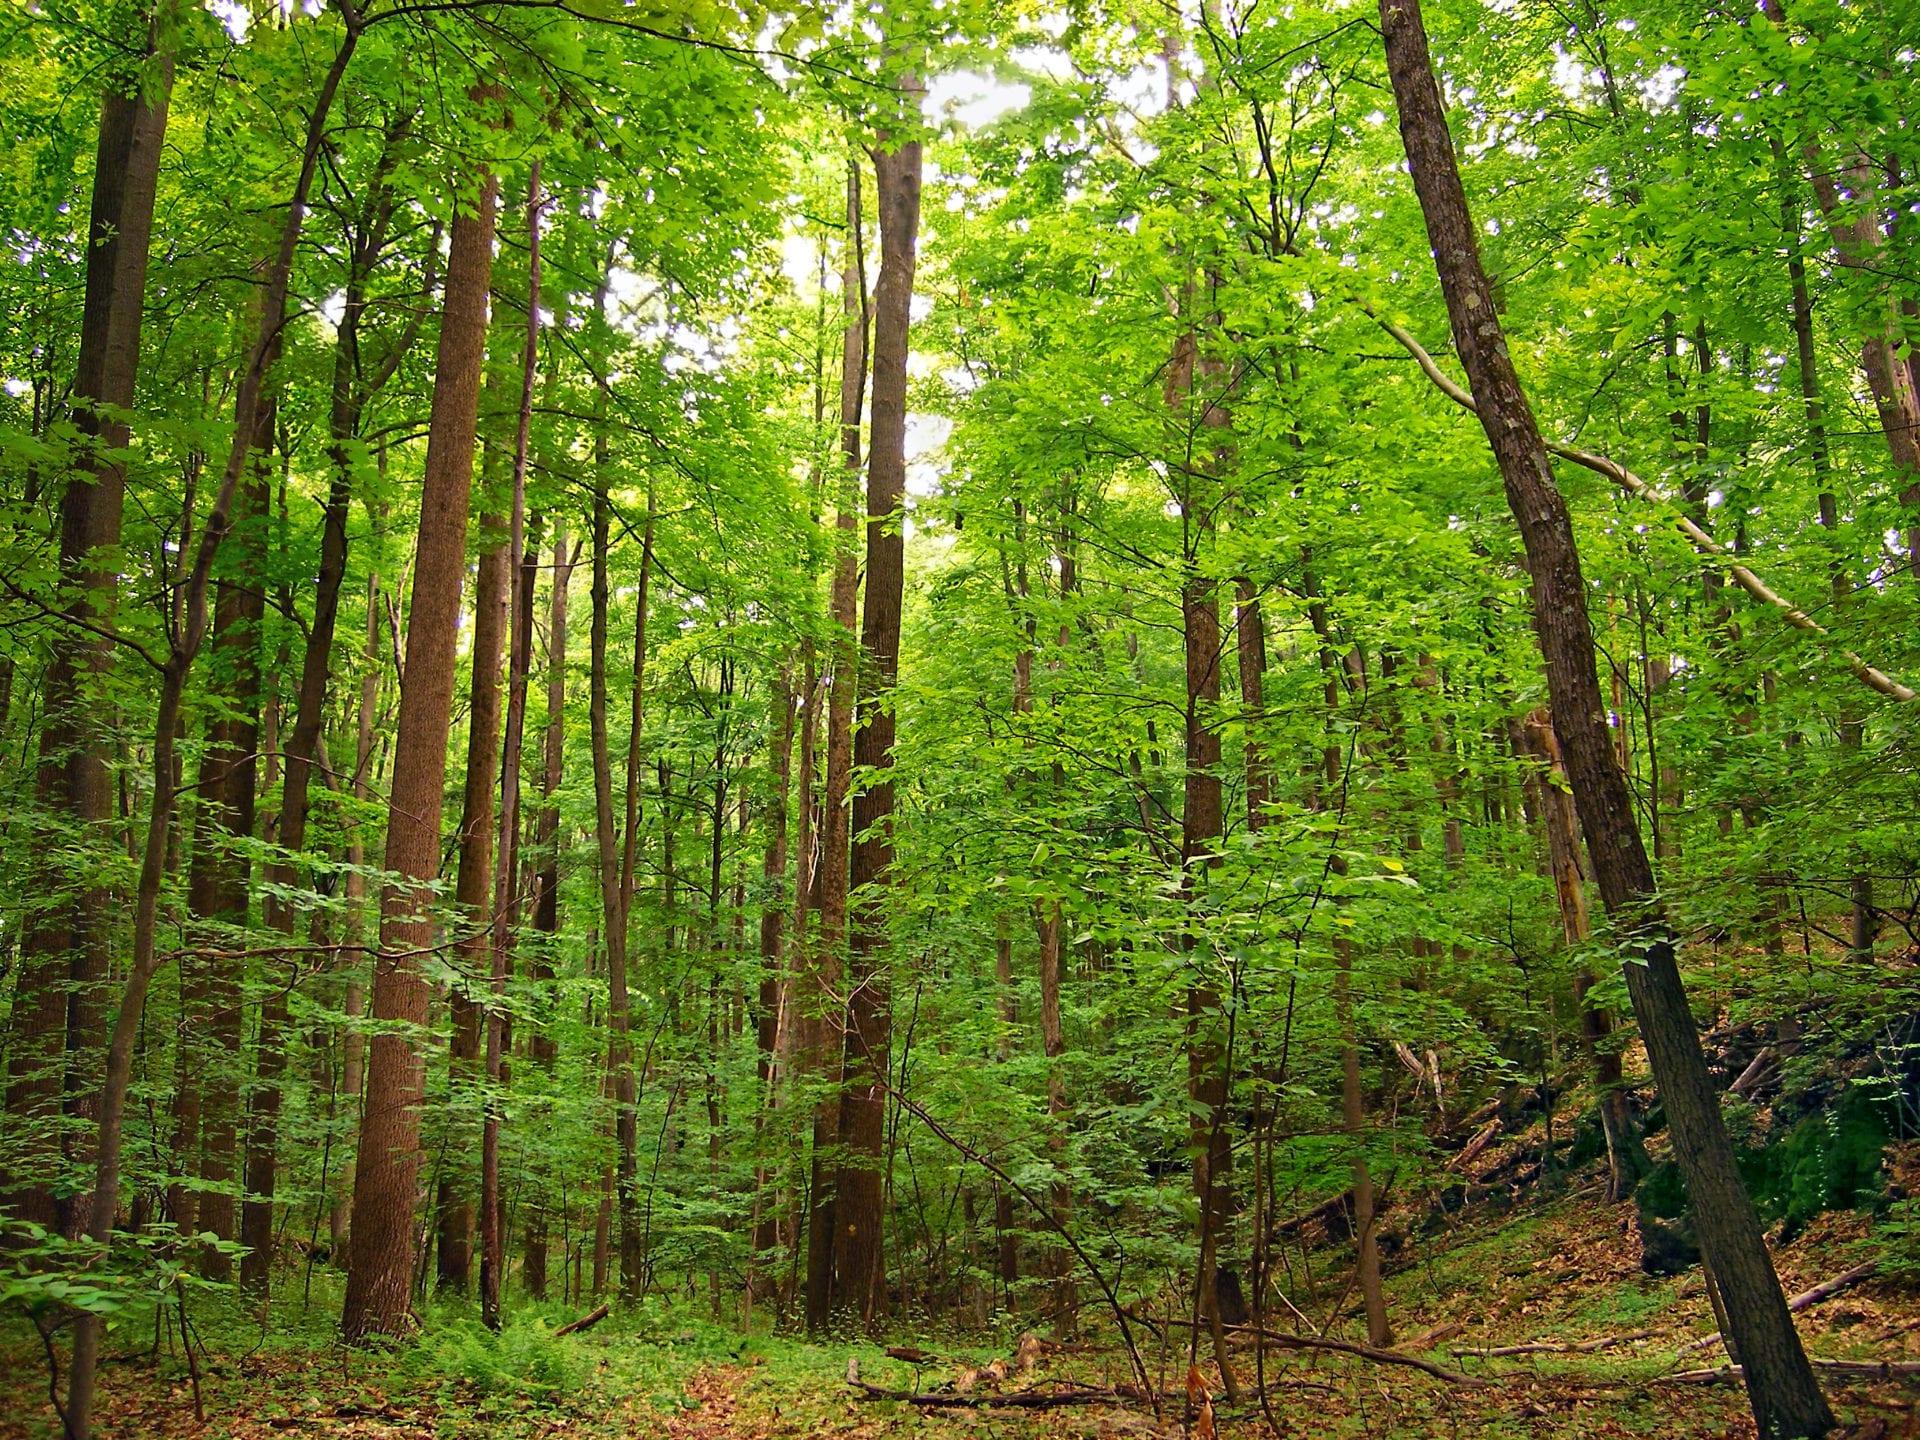 Tree Decline, Dieback, and Death